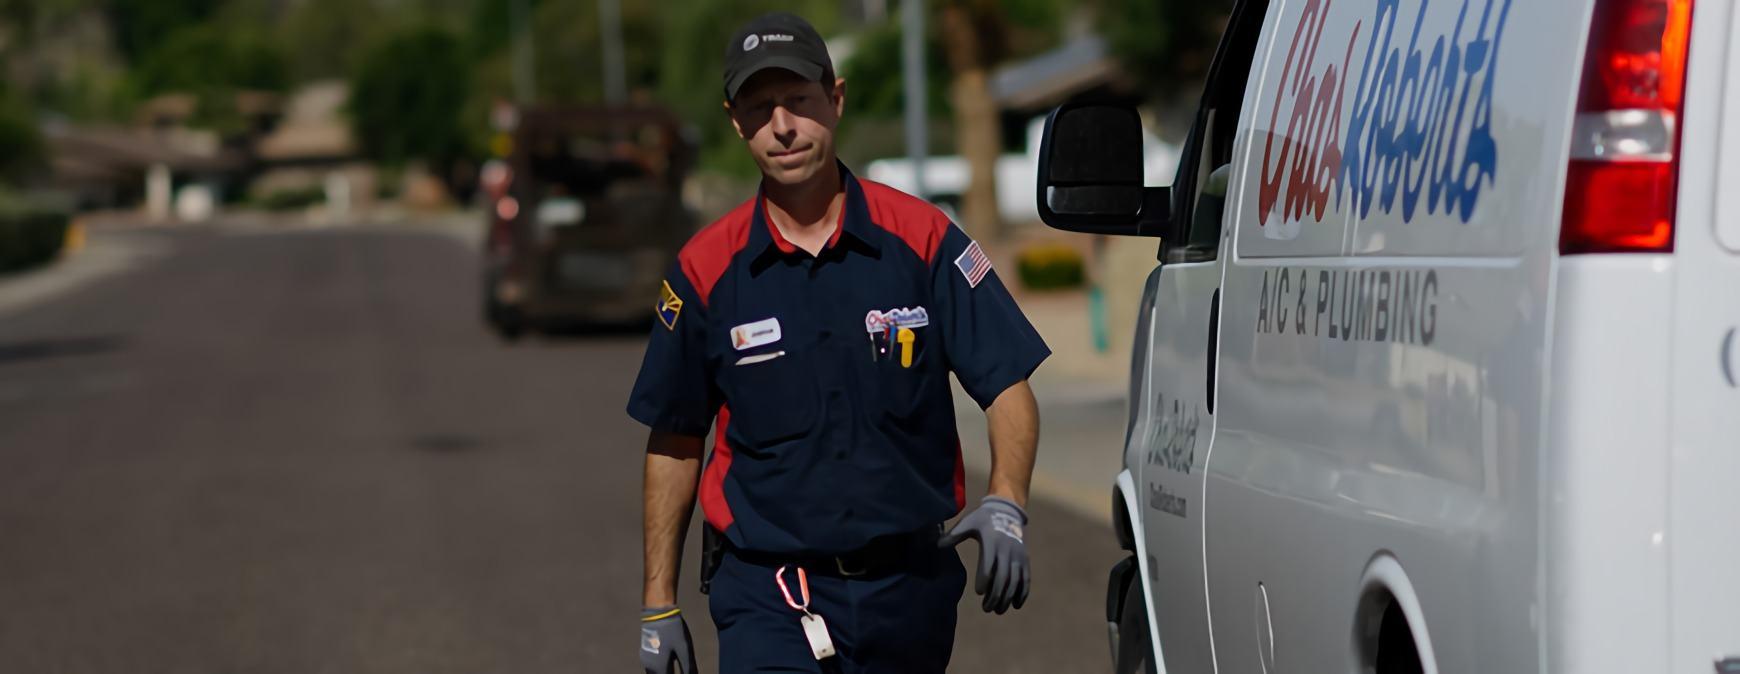 hvac technician service call